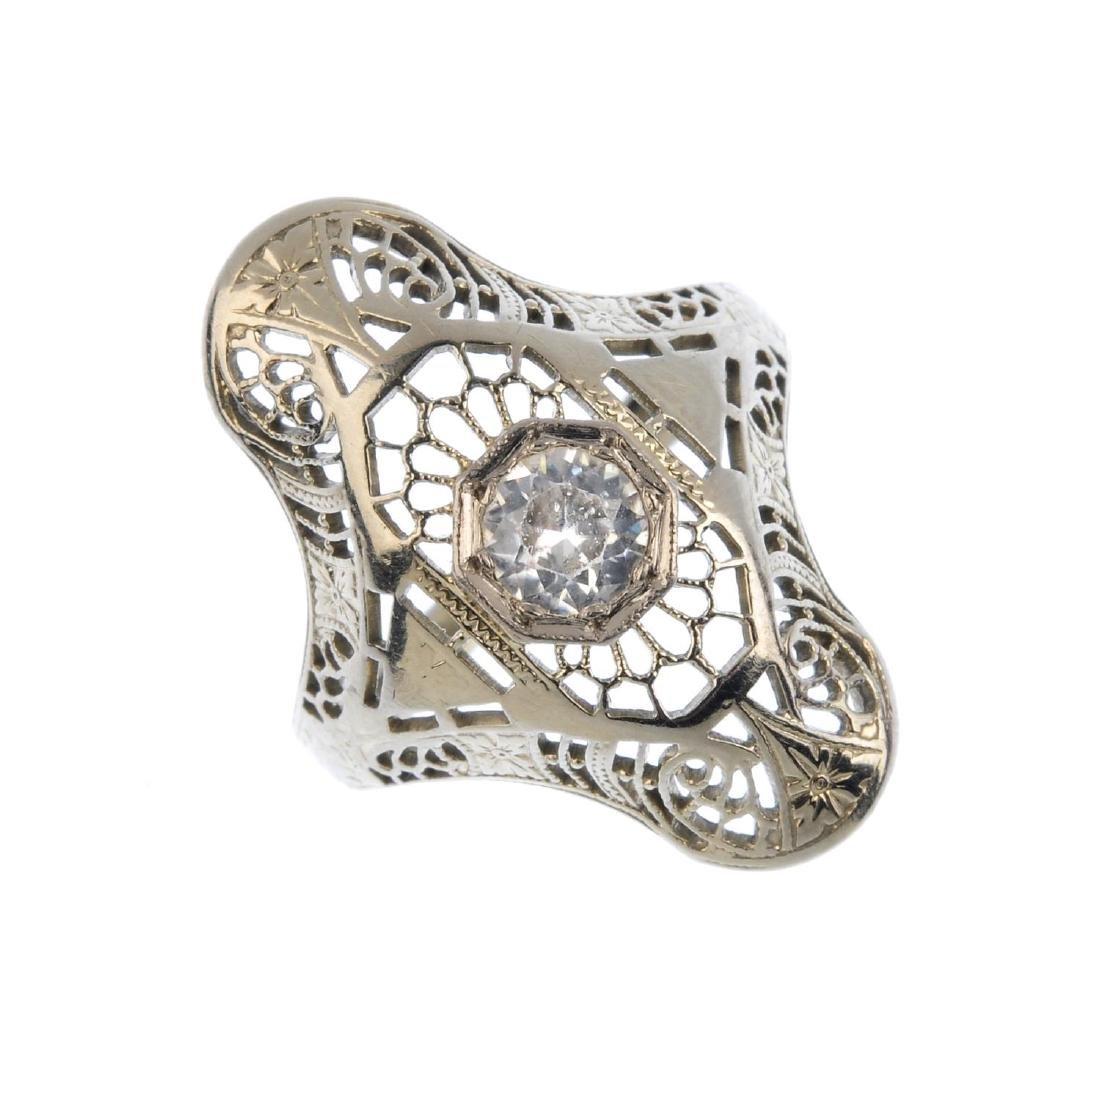 A zircon dress ring. The circular-shape zircon, within